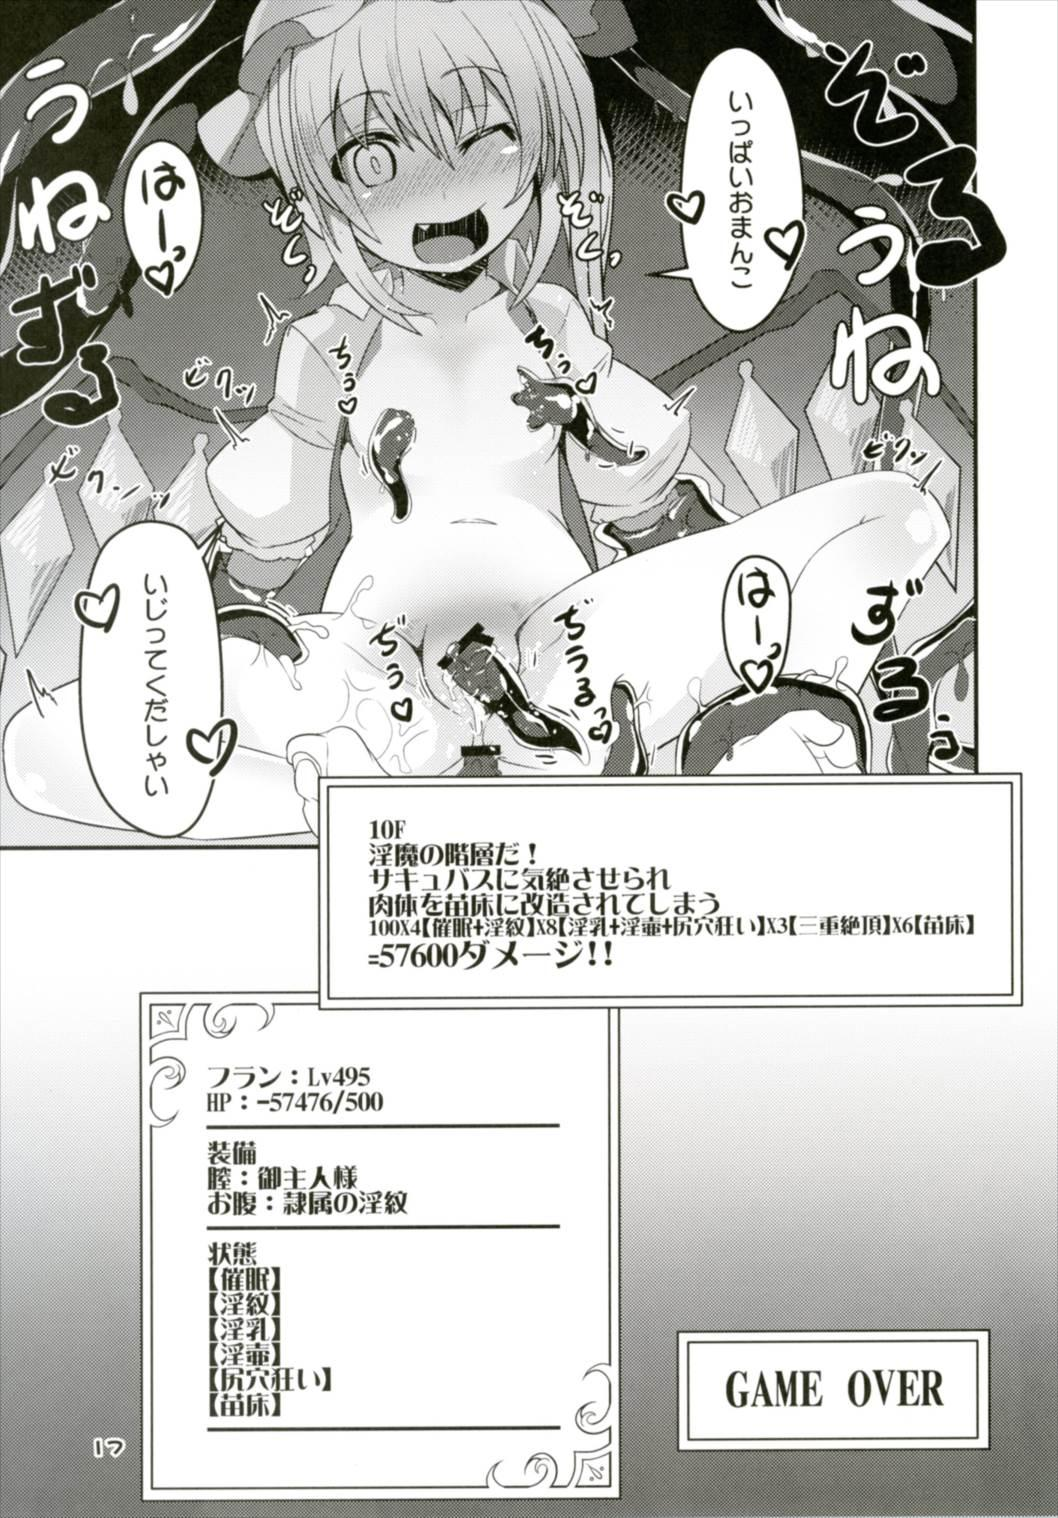 Flan-chan no Ero Trap Dungeon HARDCORE TAIL 15